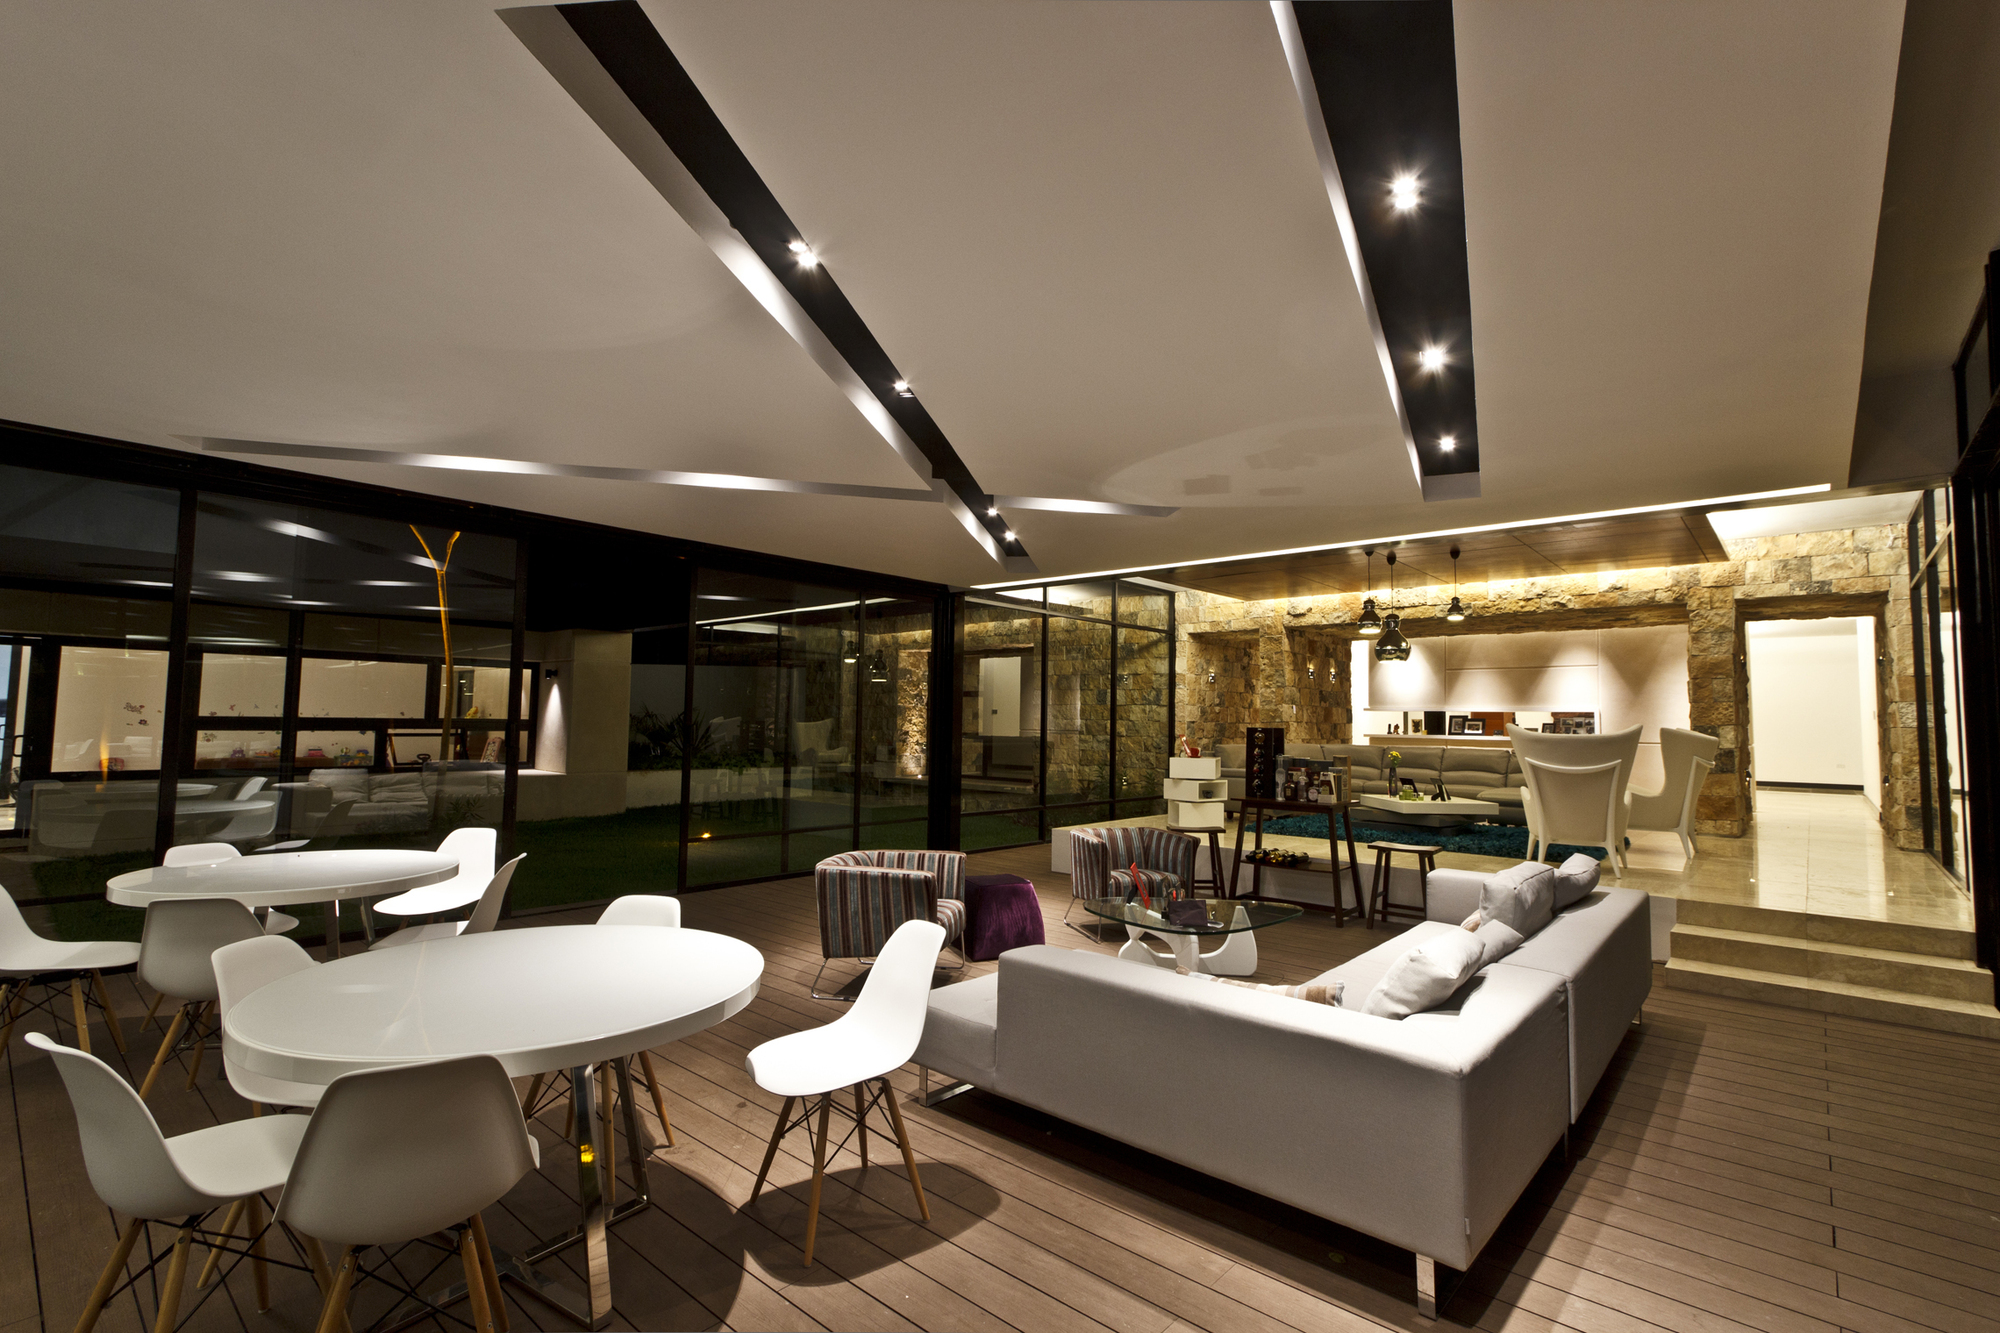 Contemporary-Comfort-At-The-Temozón-House-in-Yucatan-Mexico-10 (1)